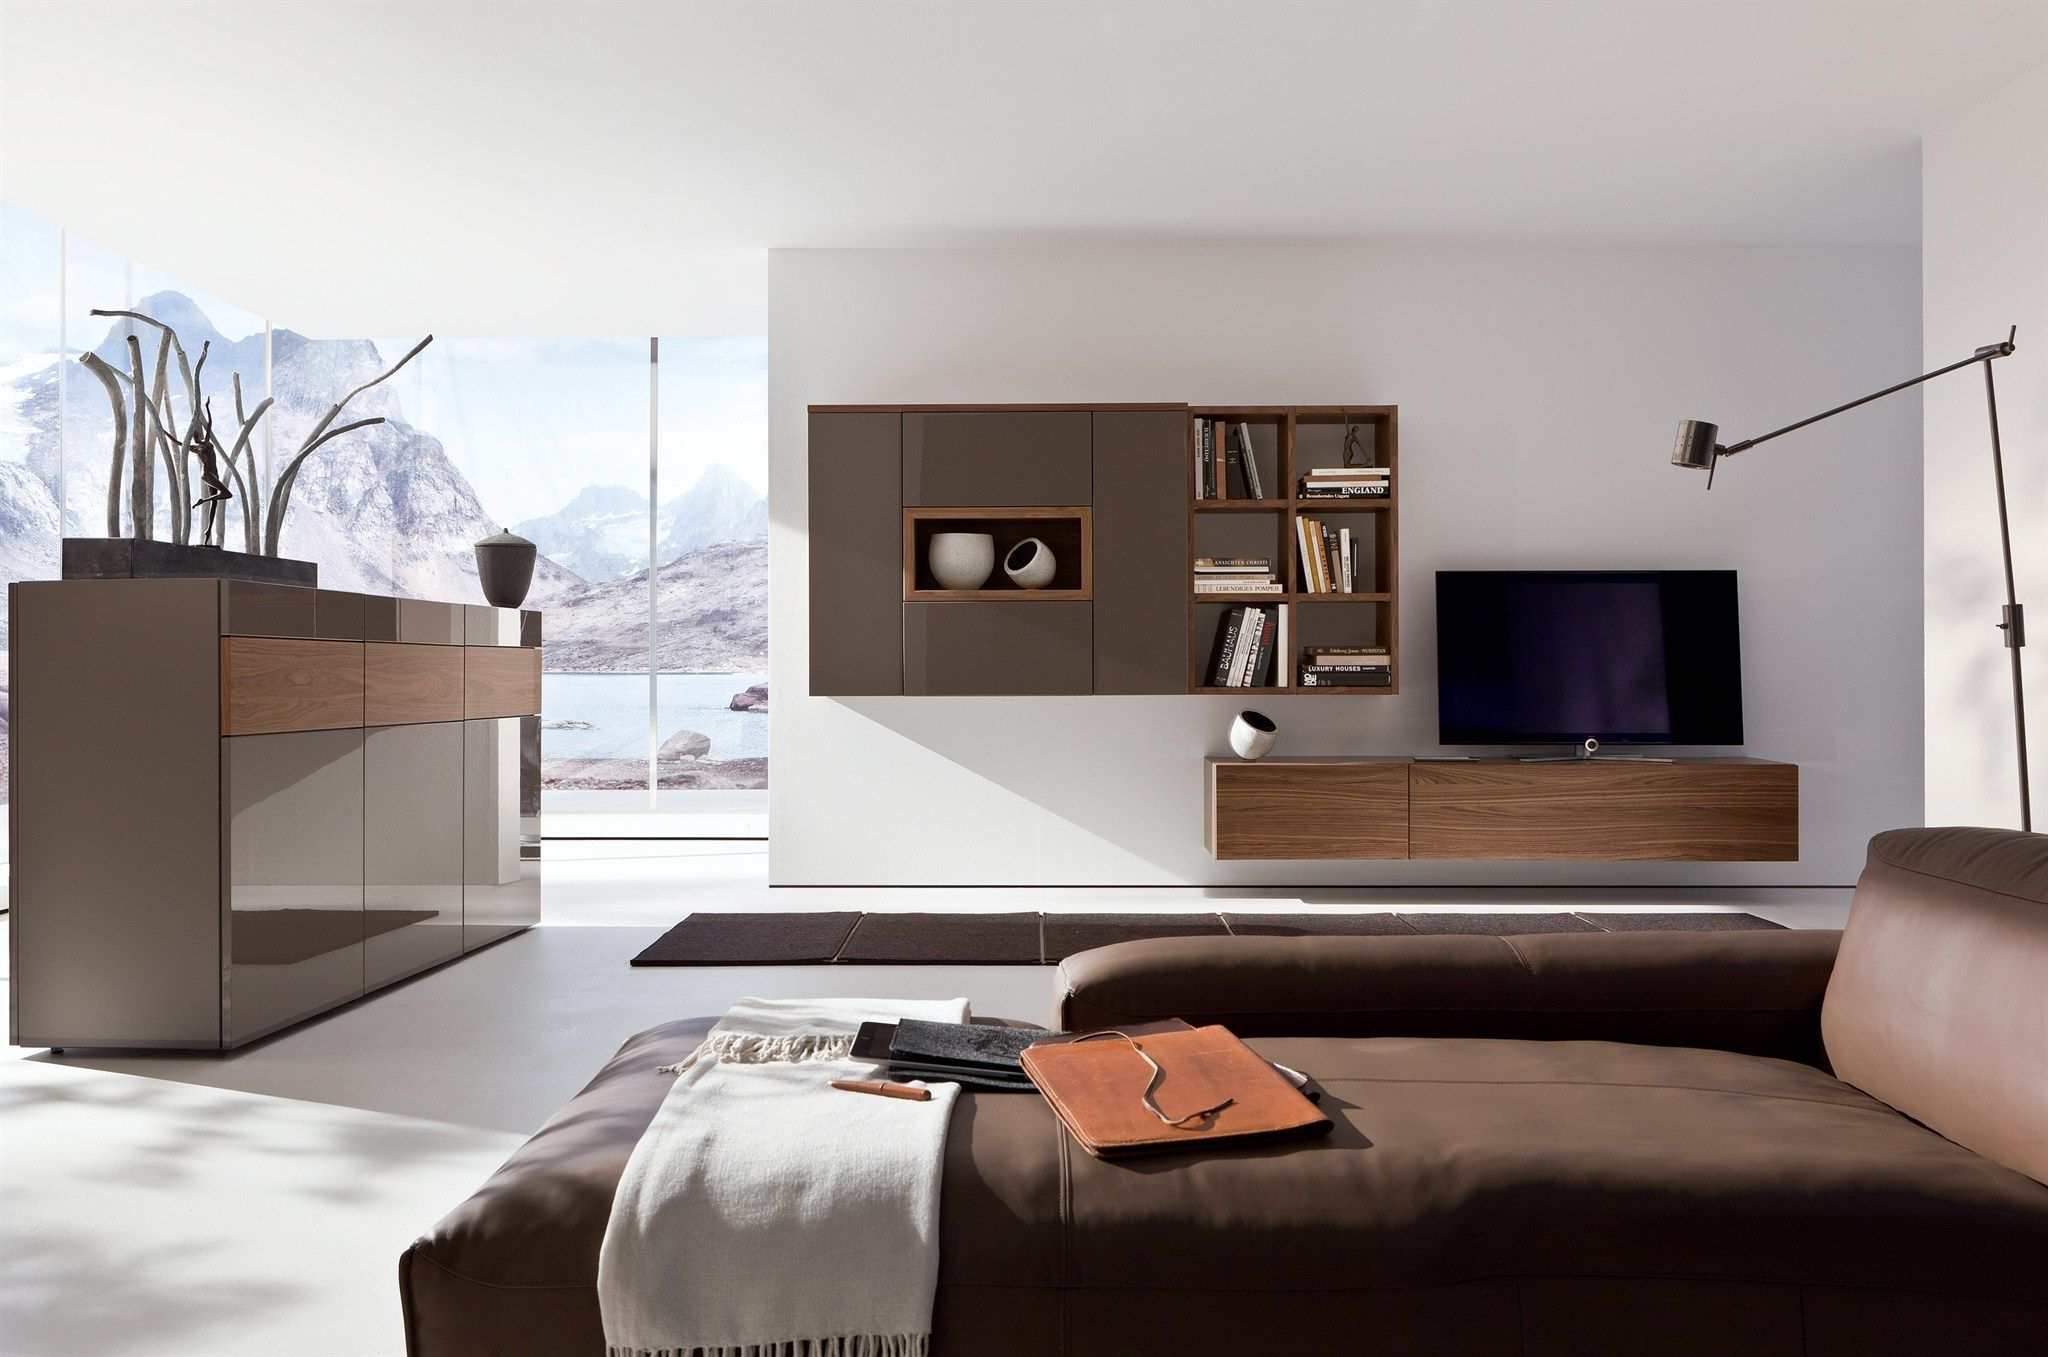 Eijerkamp Hulsta Wandcombinatie Neo Nice Tv Wall Home  # Comprar Muebles Hulsta